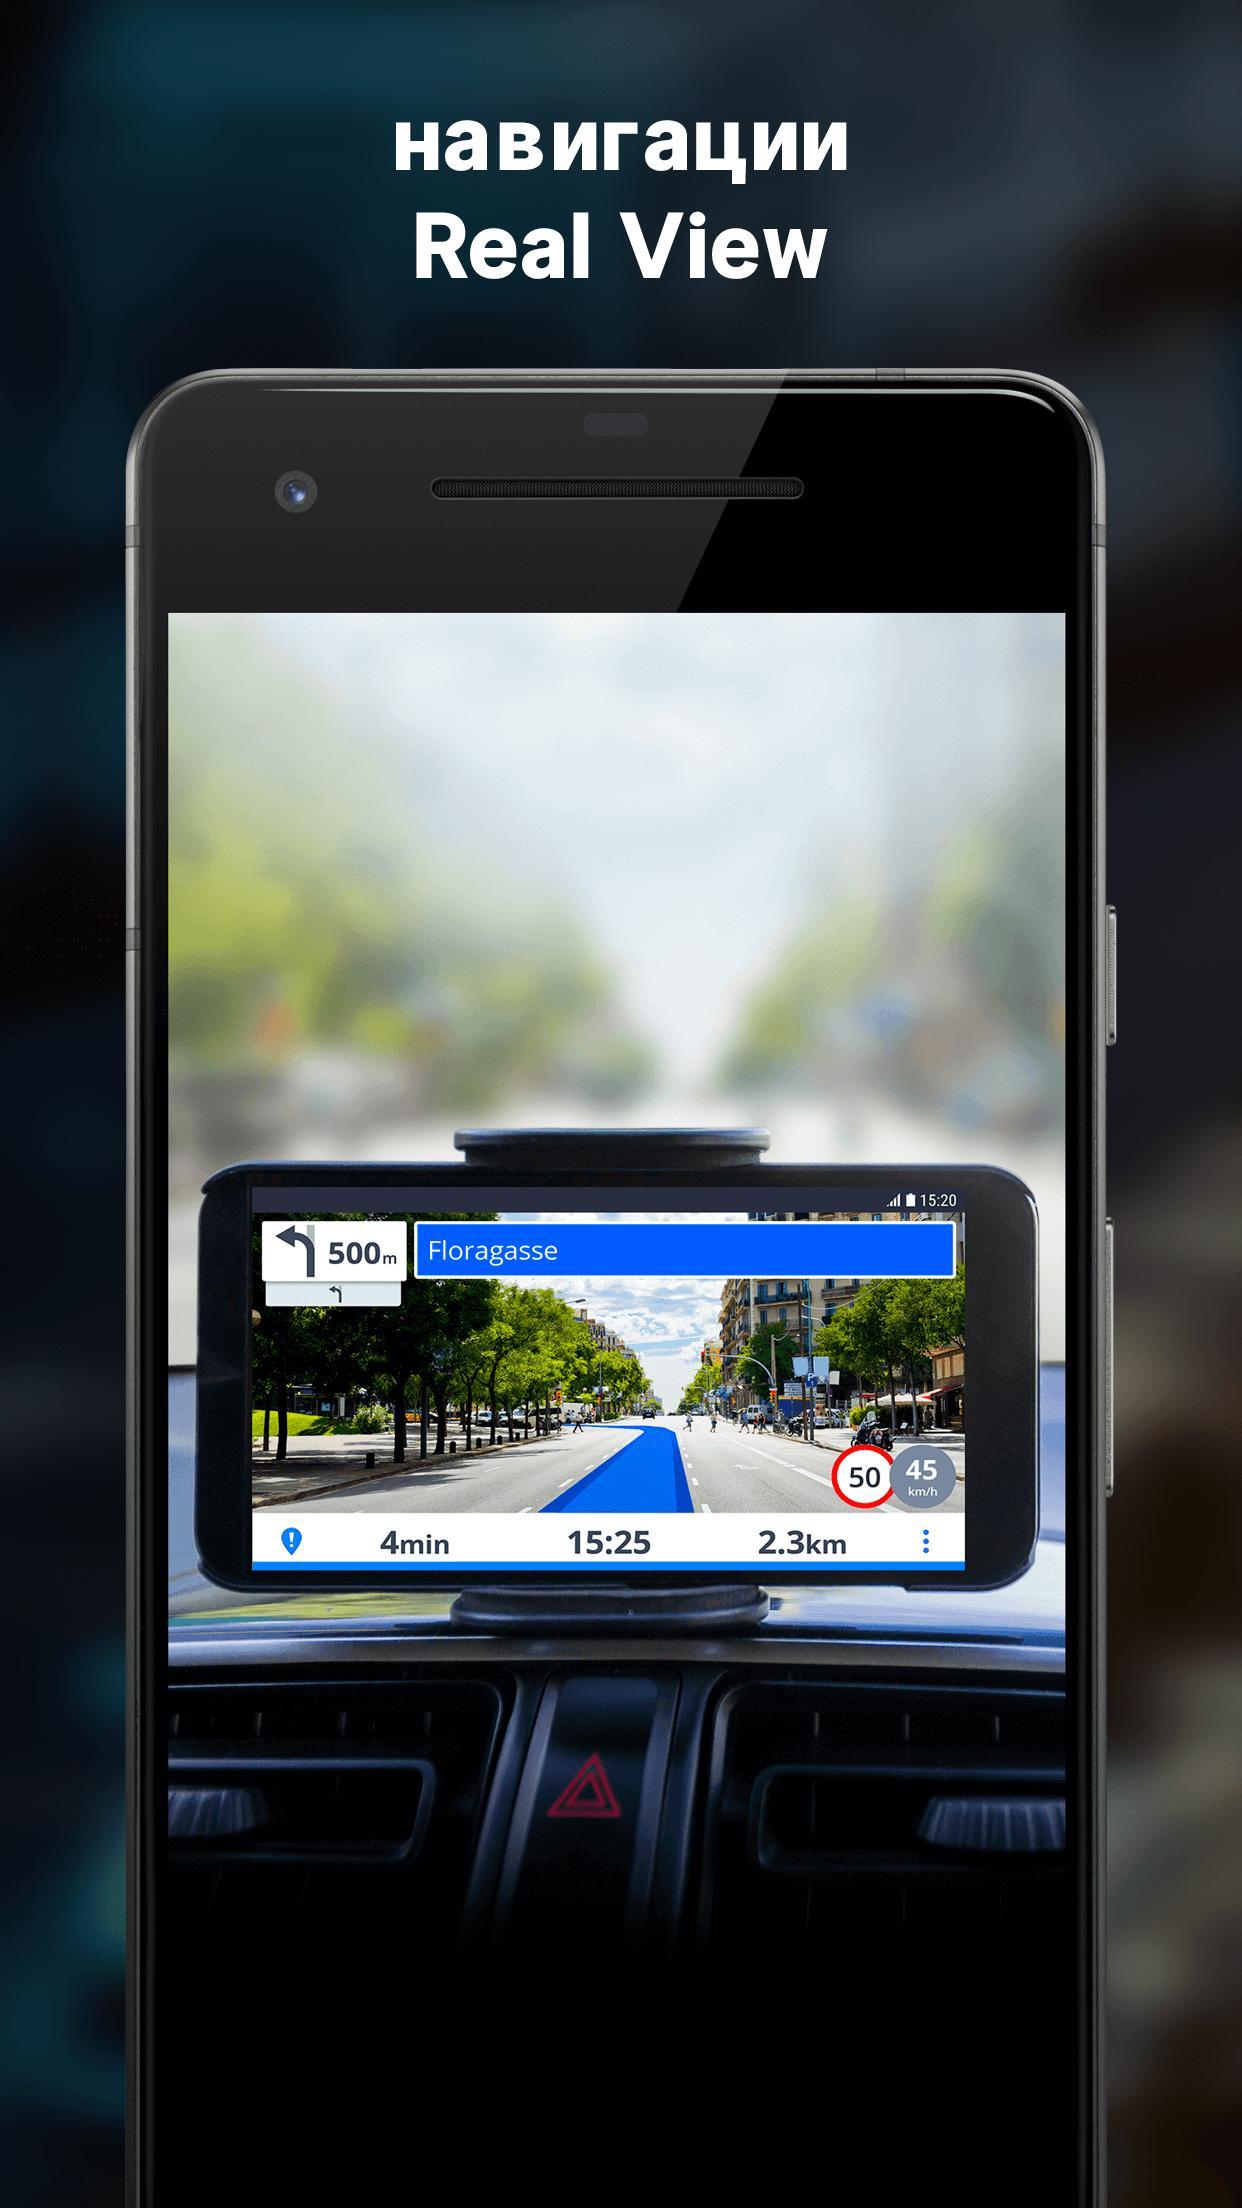 screen-5.jpg?fakeurl=1&type=.jpg